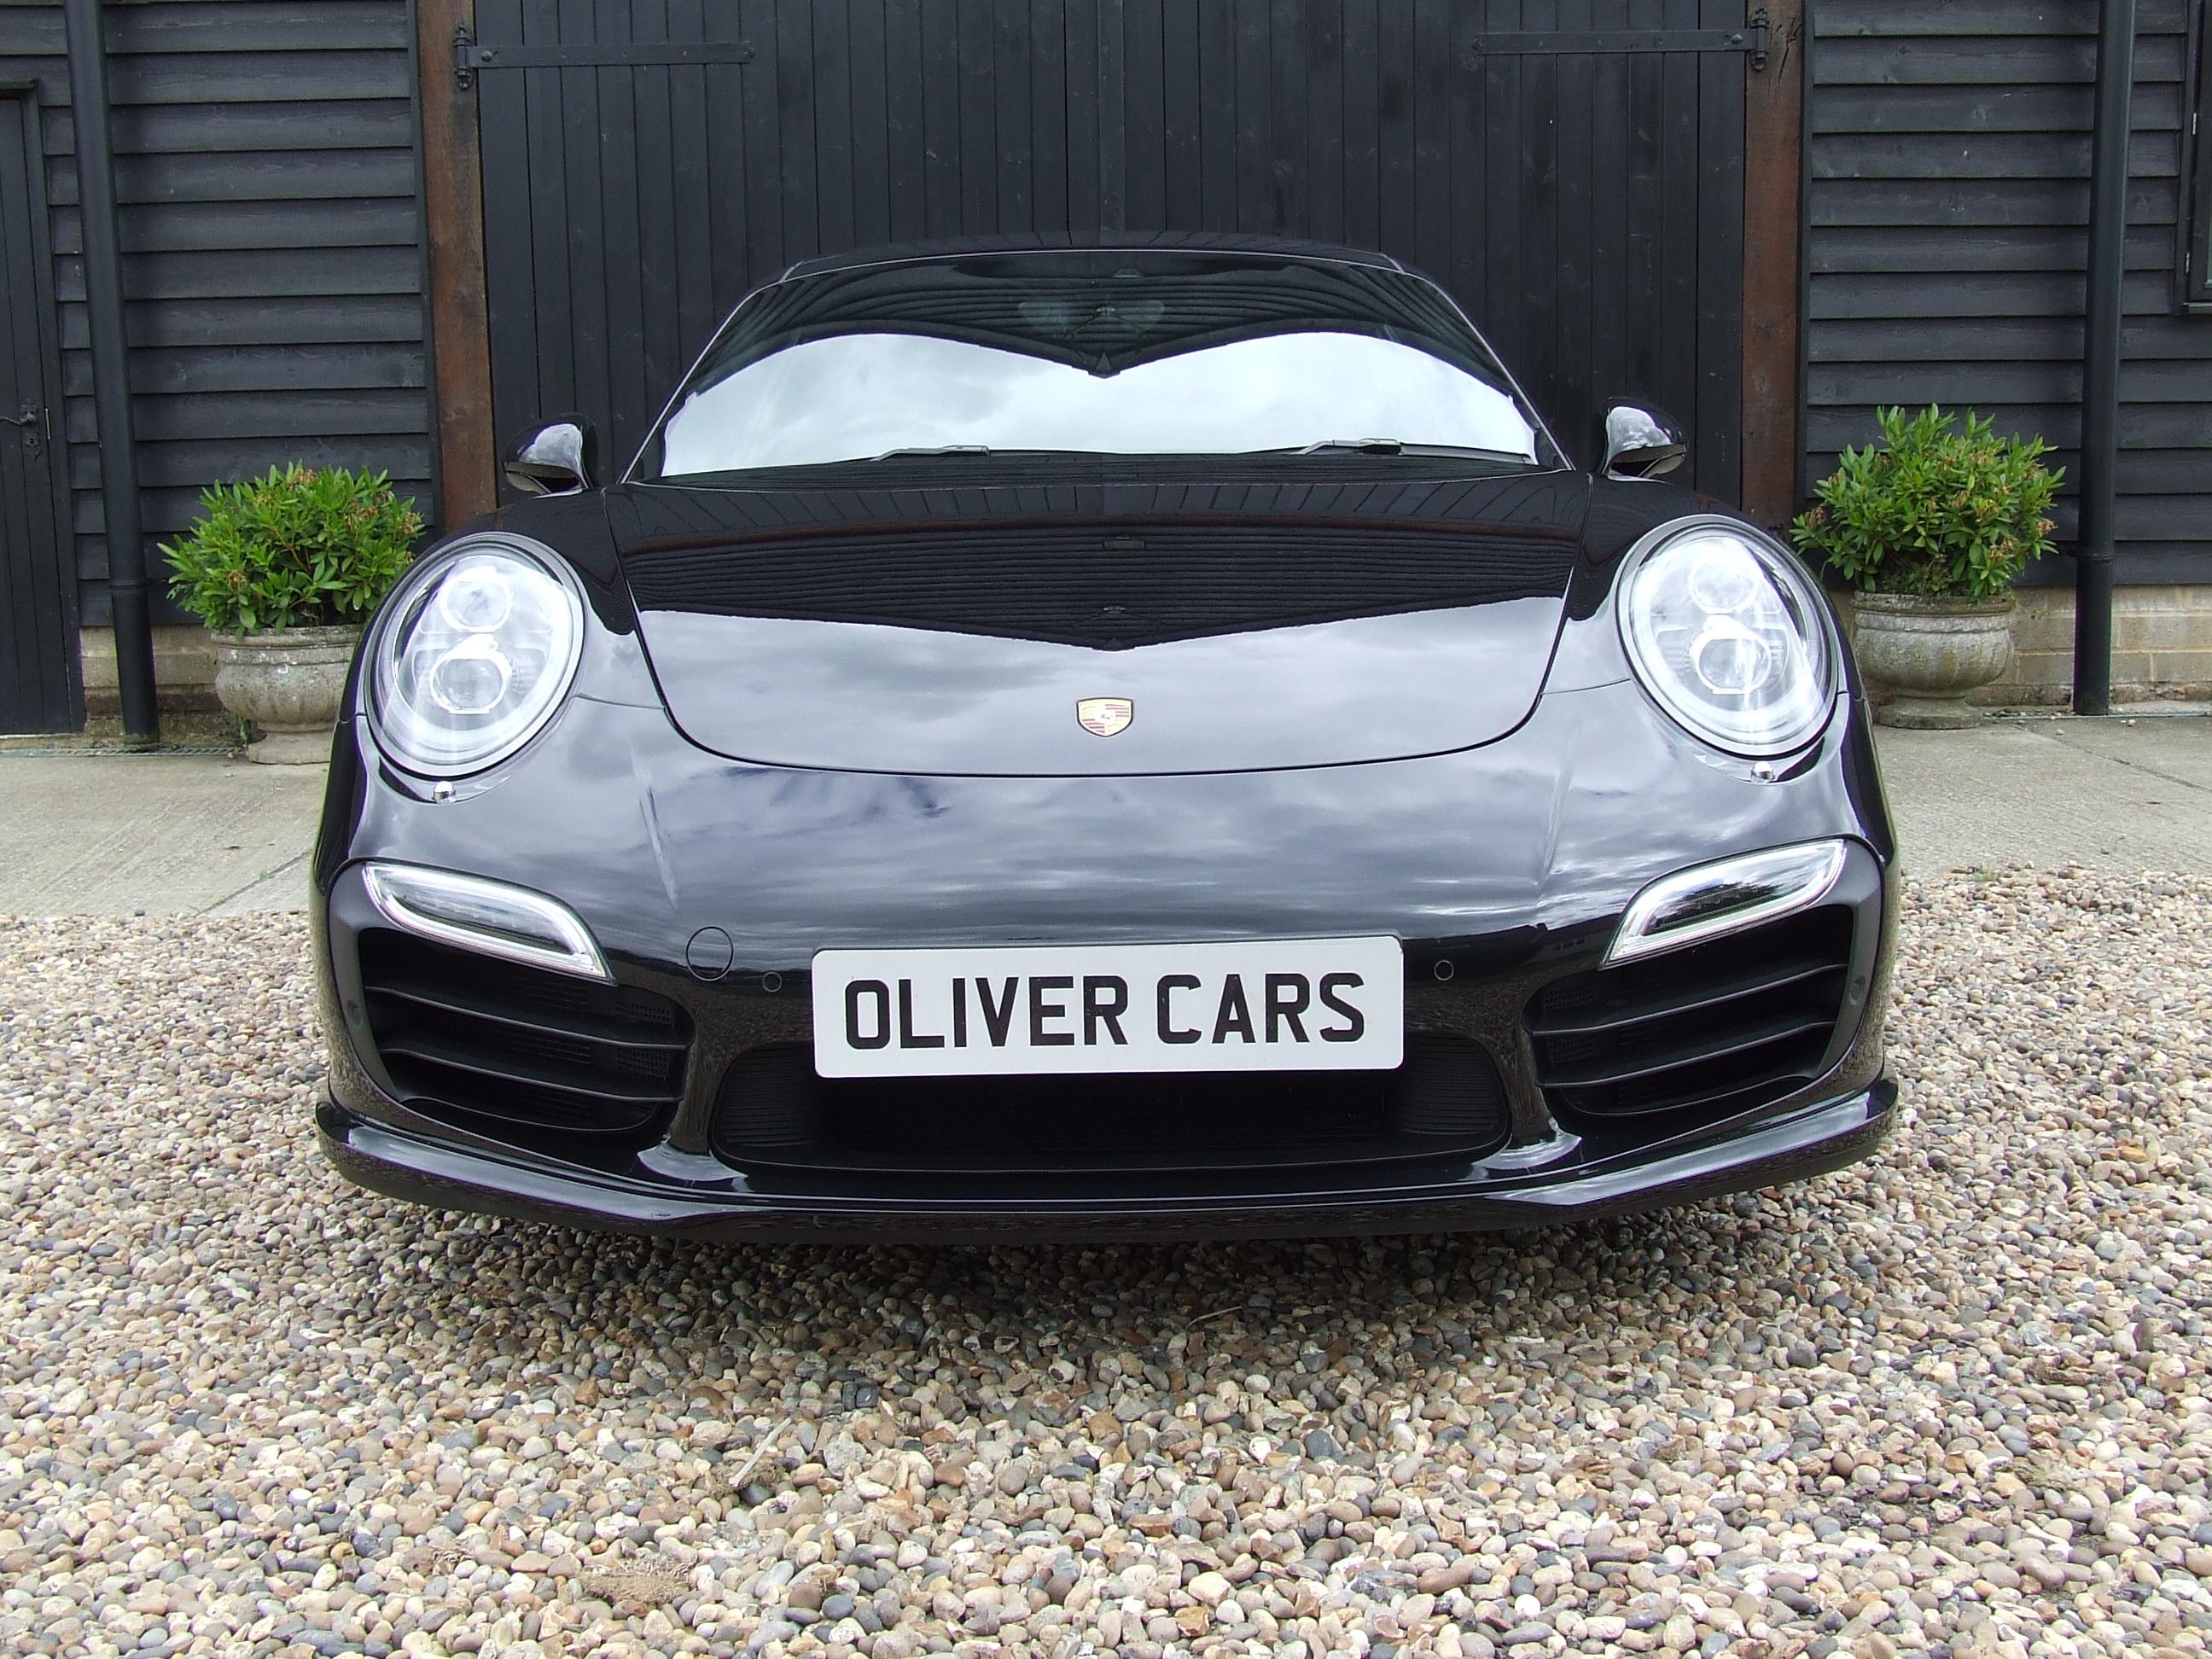 Porsche 911 991 Turbo S Pdk 3 8 Oliver Cars Ltd